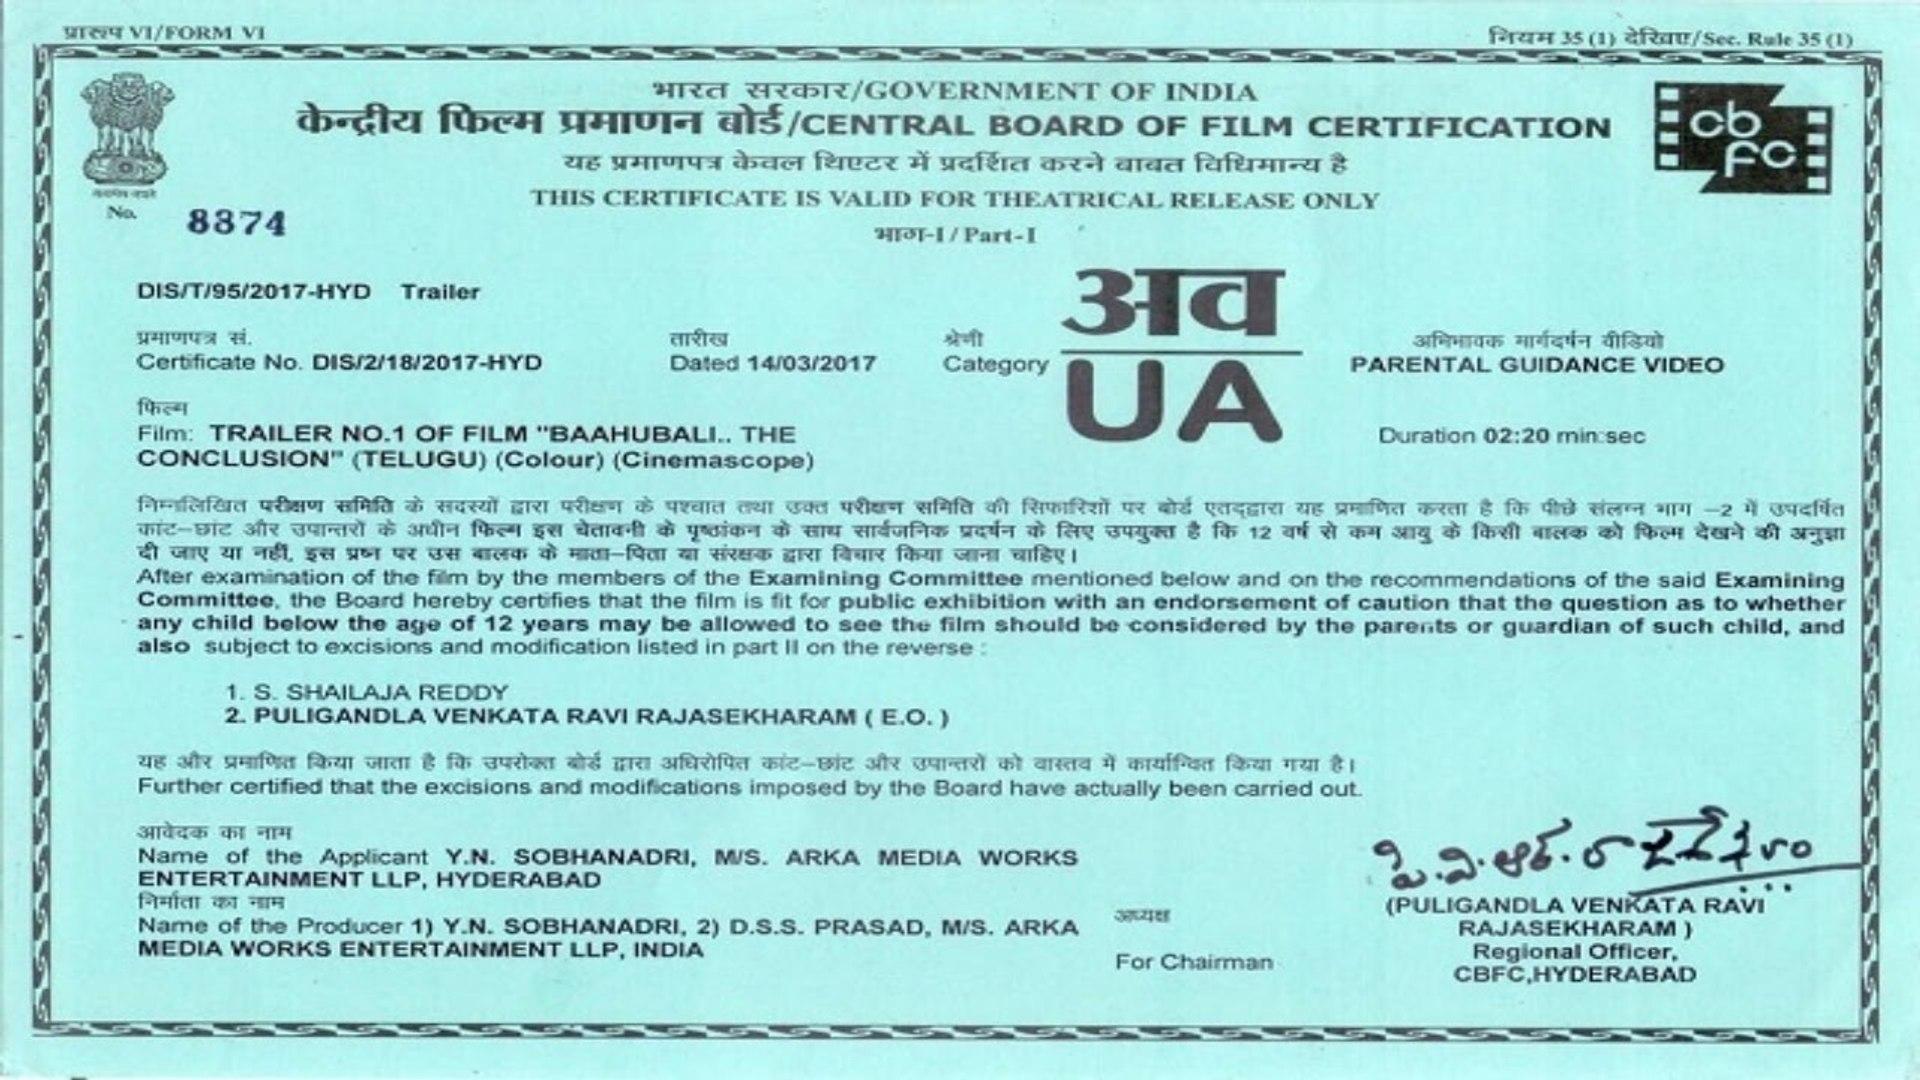 Bhaag Milkha Bhaag F u l l  Hindi Movie Bhaag Milkha Bhaag[6] (English: